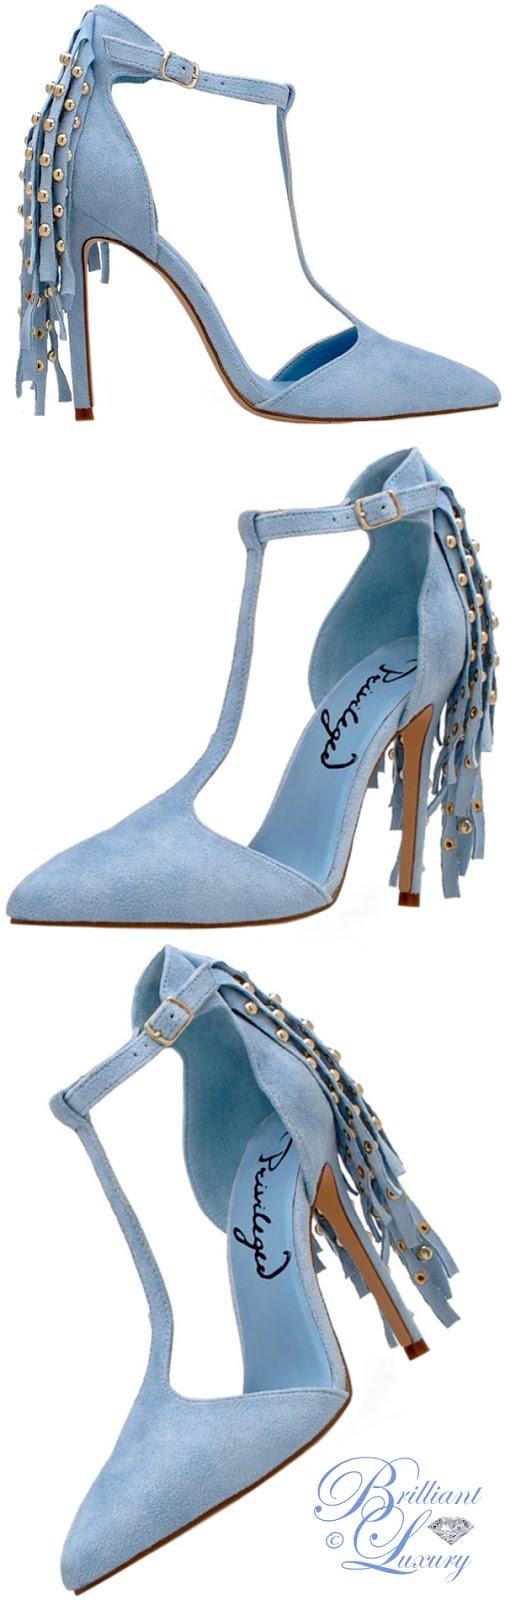 Brilliant Luxury ♦ Privileged Anais T-strap sandals